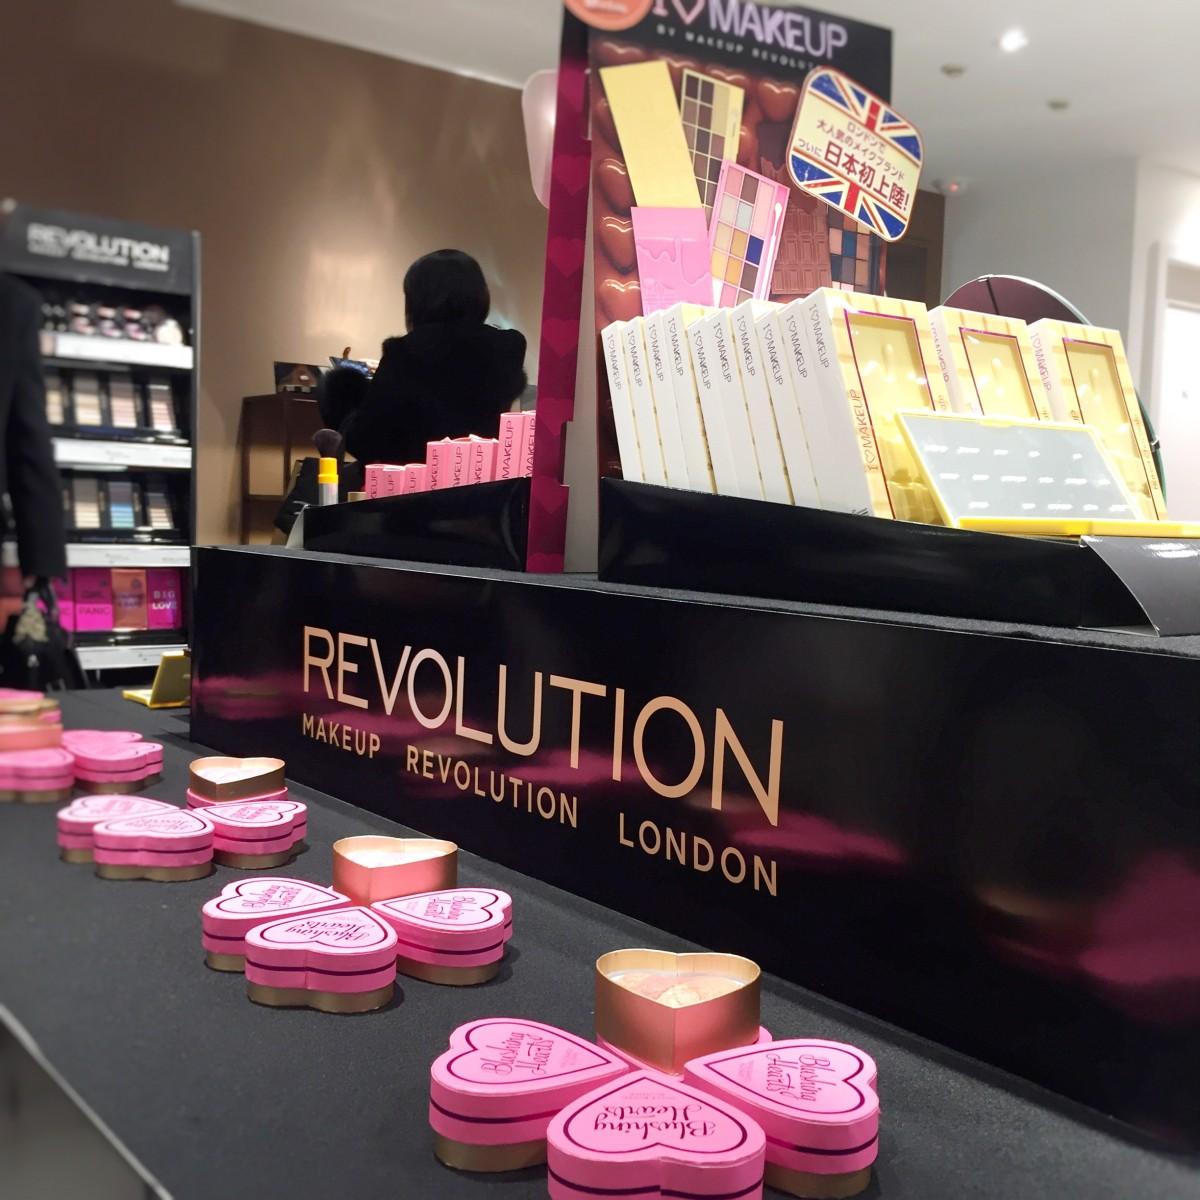 Image title. Makeup Revolution London(メイクアップ レボリューション